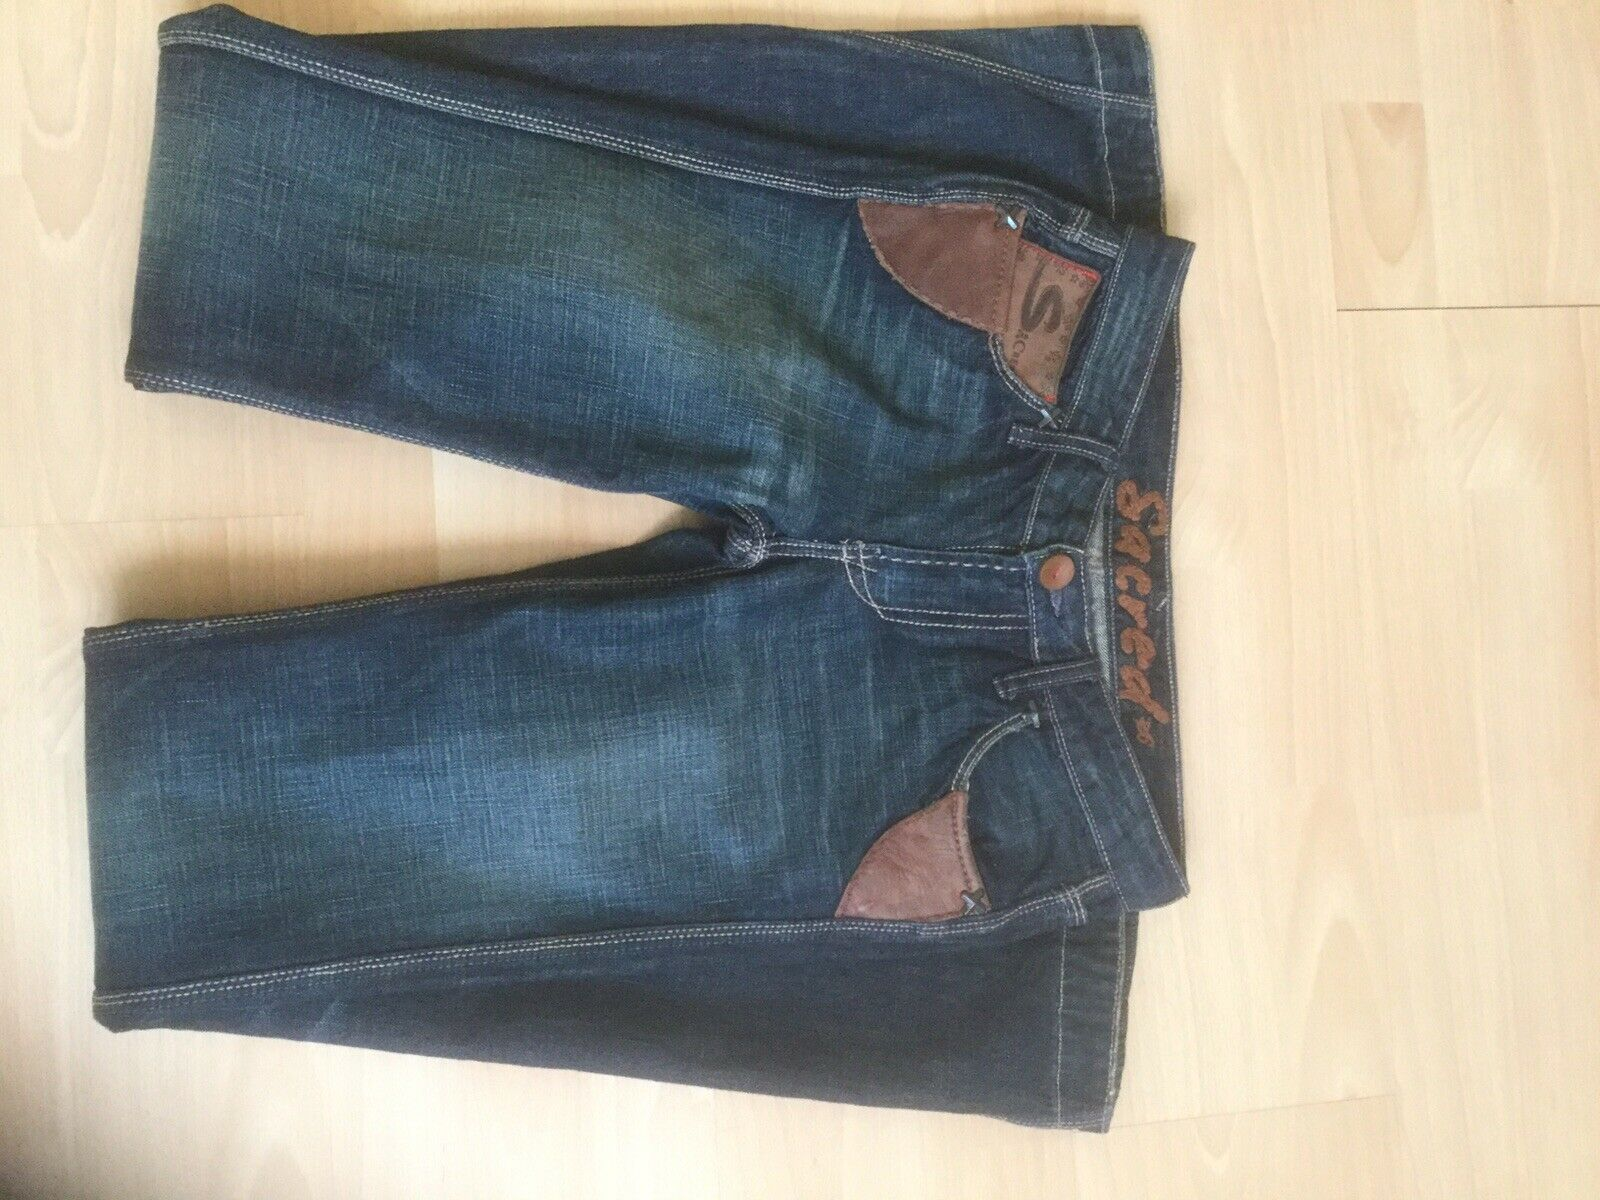 sacrot jeans Größe 26